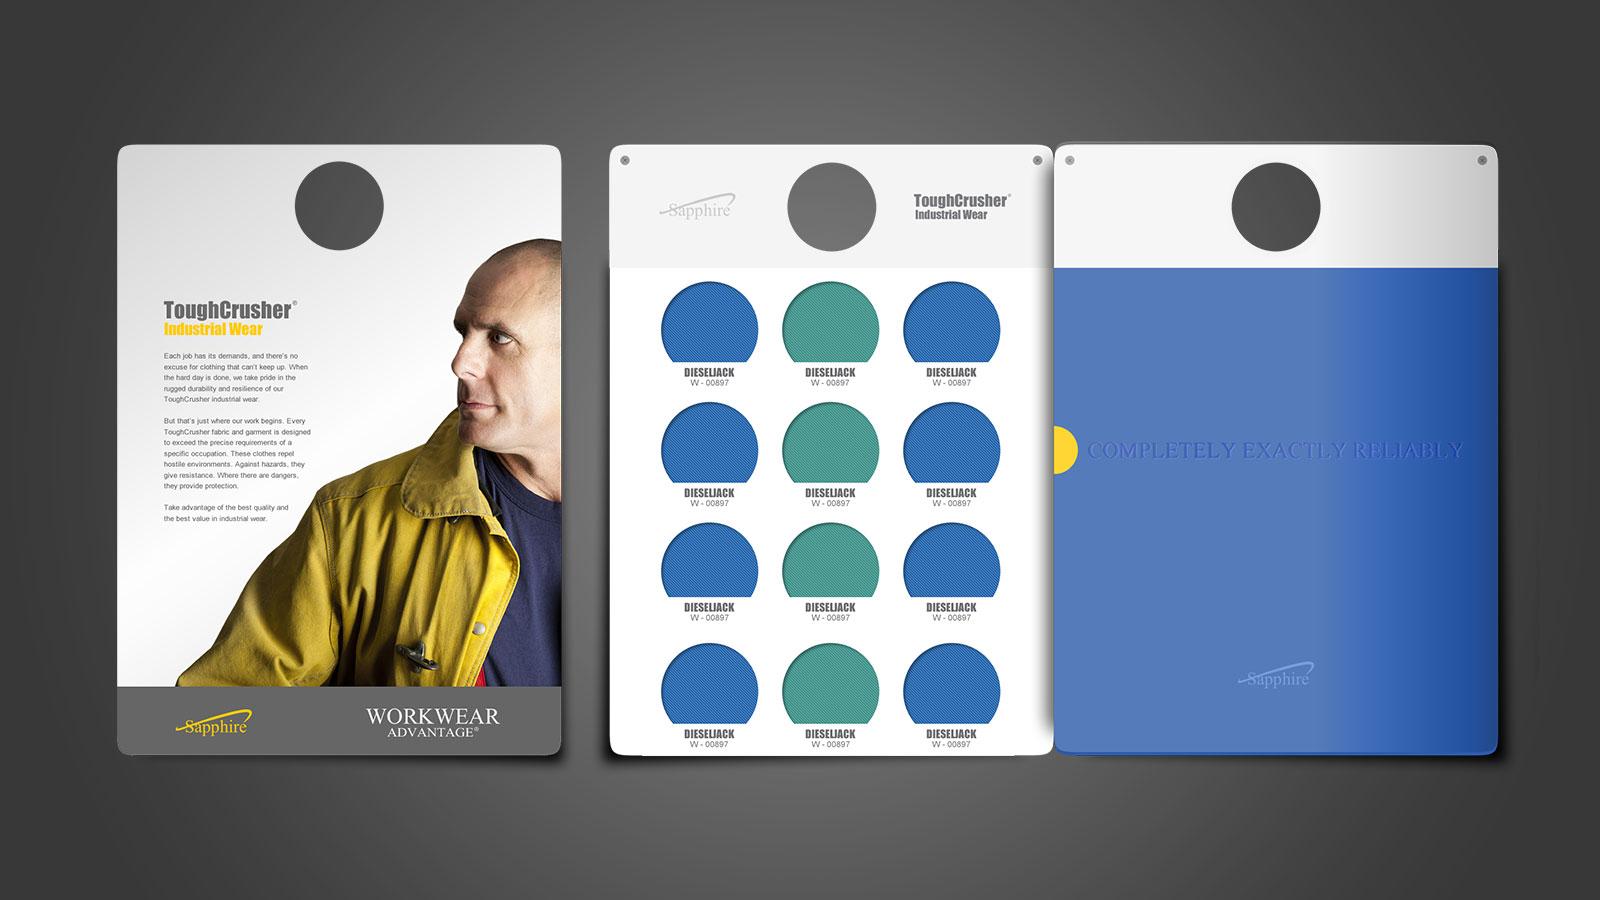 sapphire-textiles-graphic-brand-design-web-designer-hiline-lahore-pakistan-022